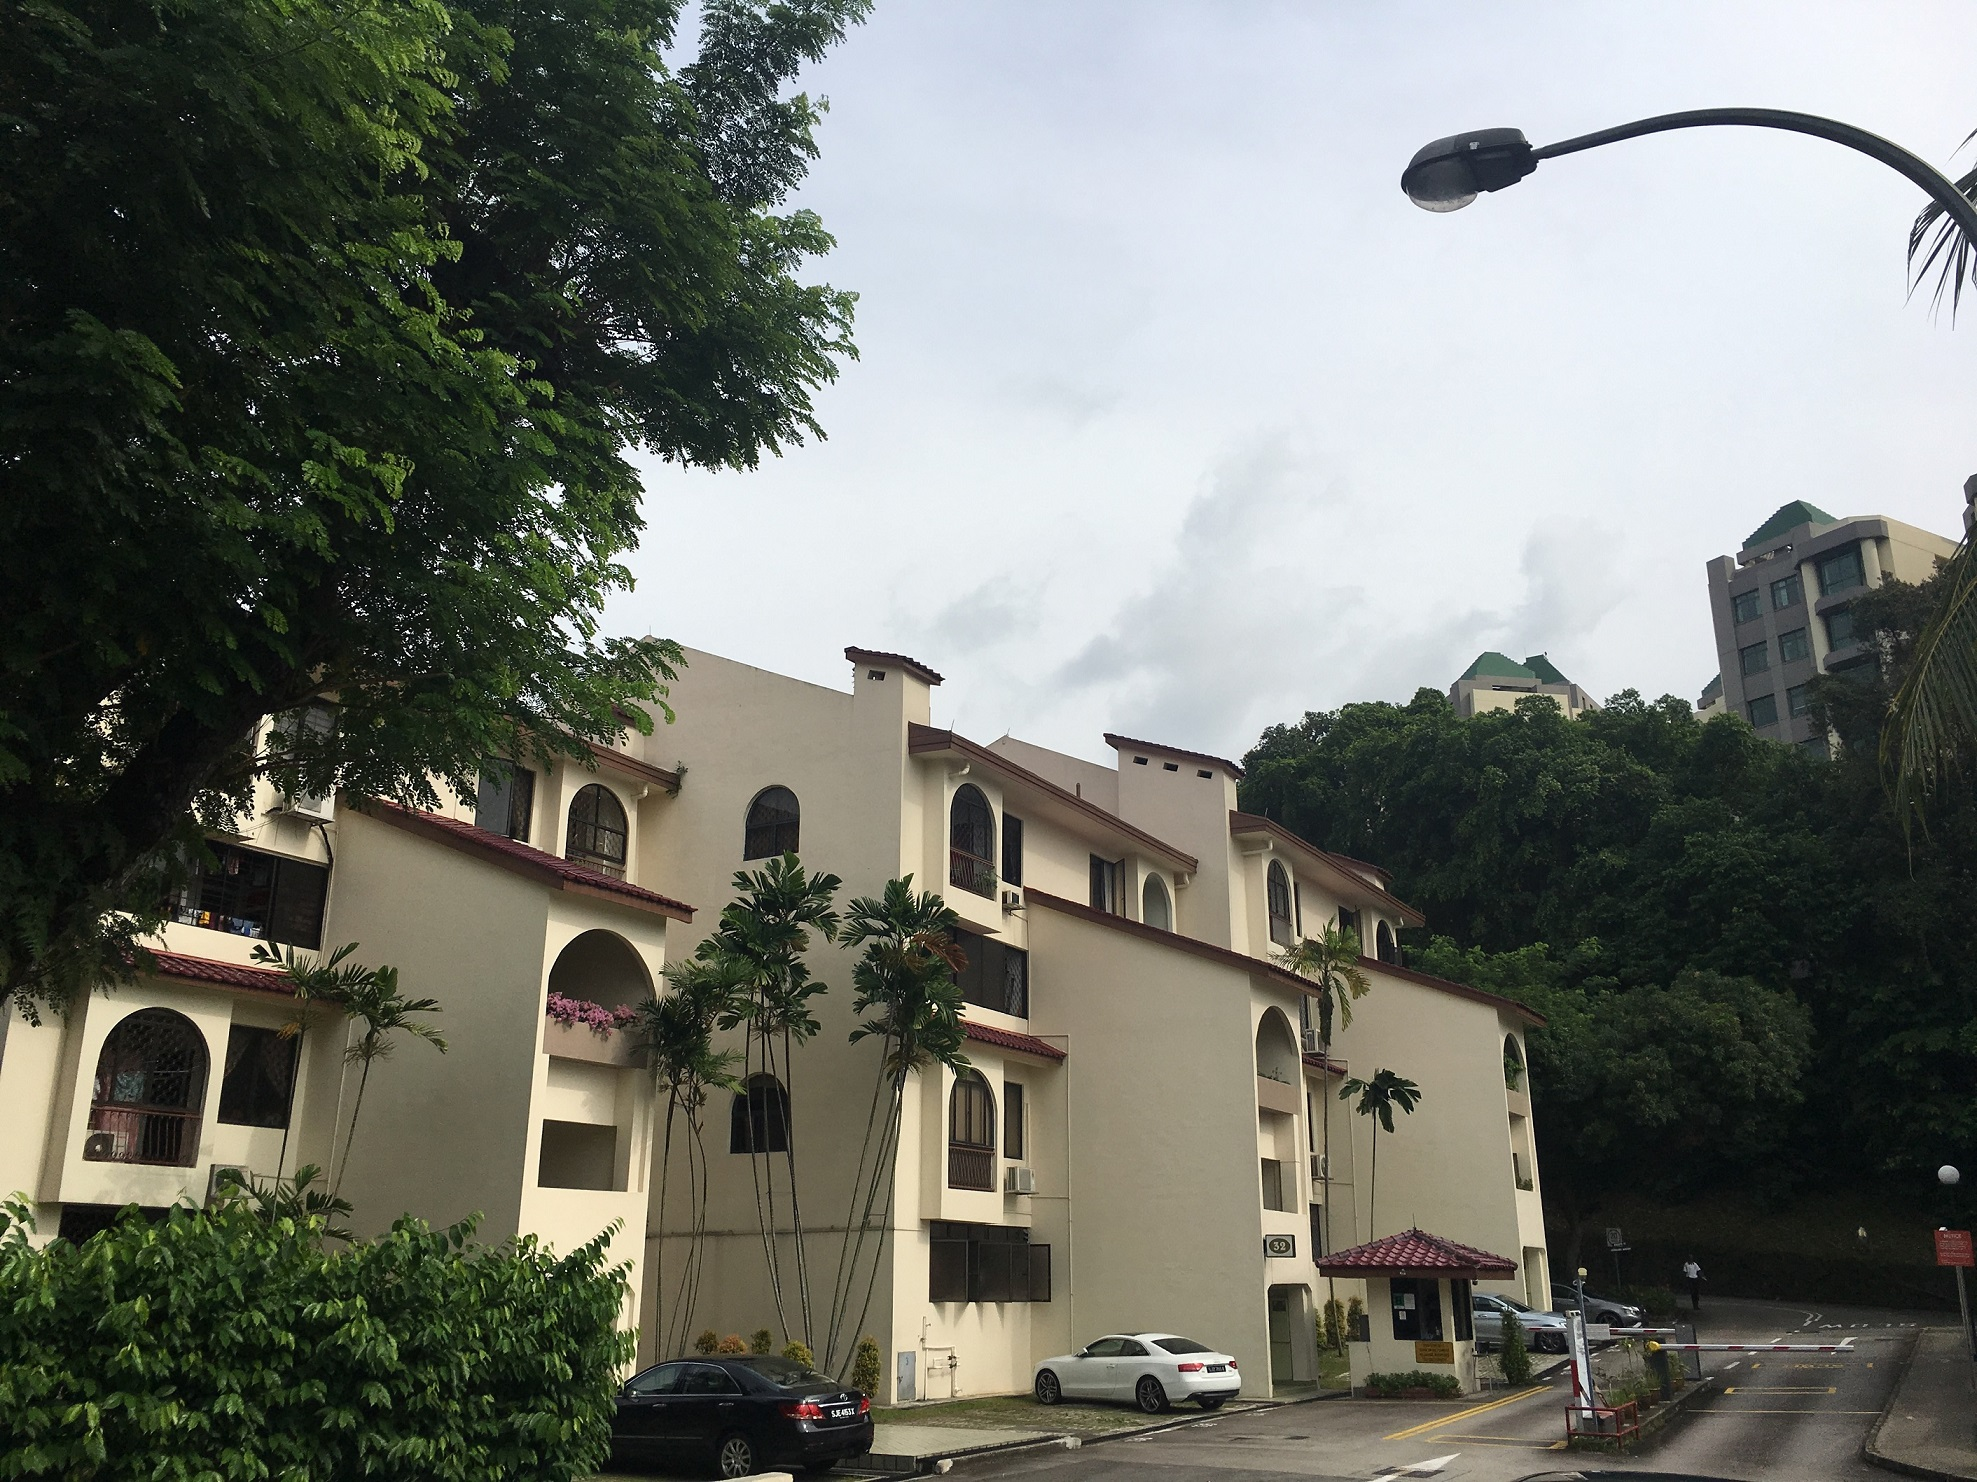 EDGEPROP SINGAPORE -  另一个因为阻断措施而被推迟推出的项目是Forett@Bukit Timah,这是青建地产和Perennial地产对前Goodluck Garden(图)的重新开发(图片来源:莱坊)